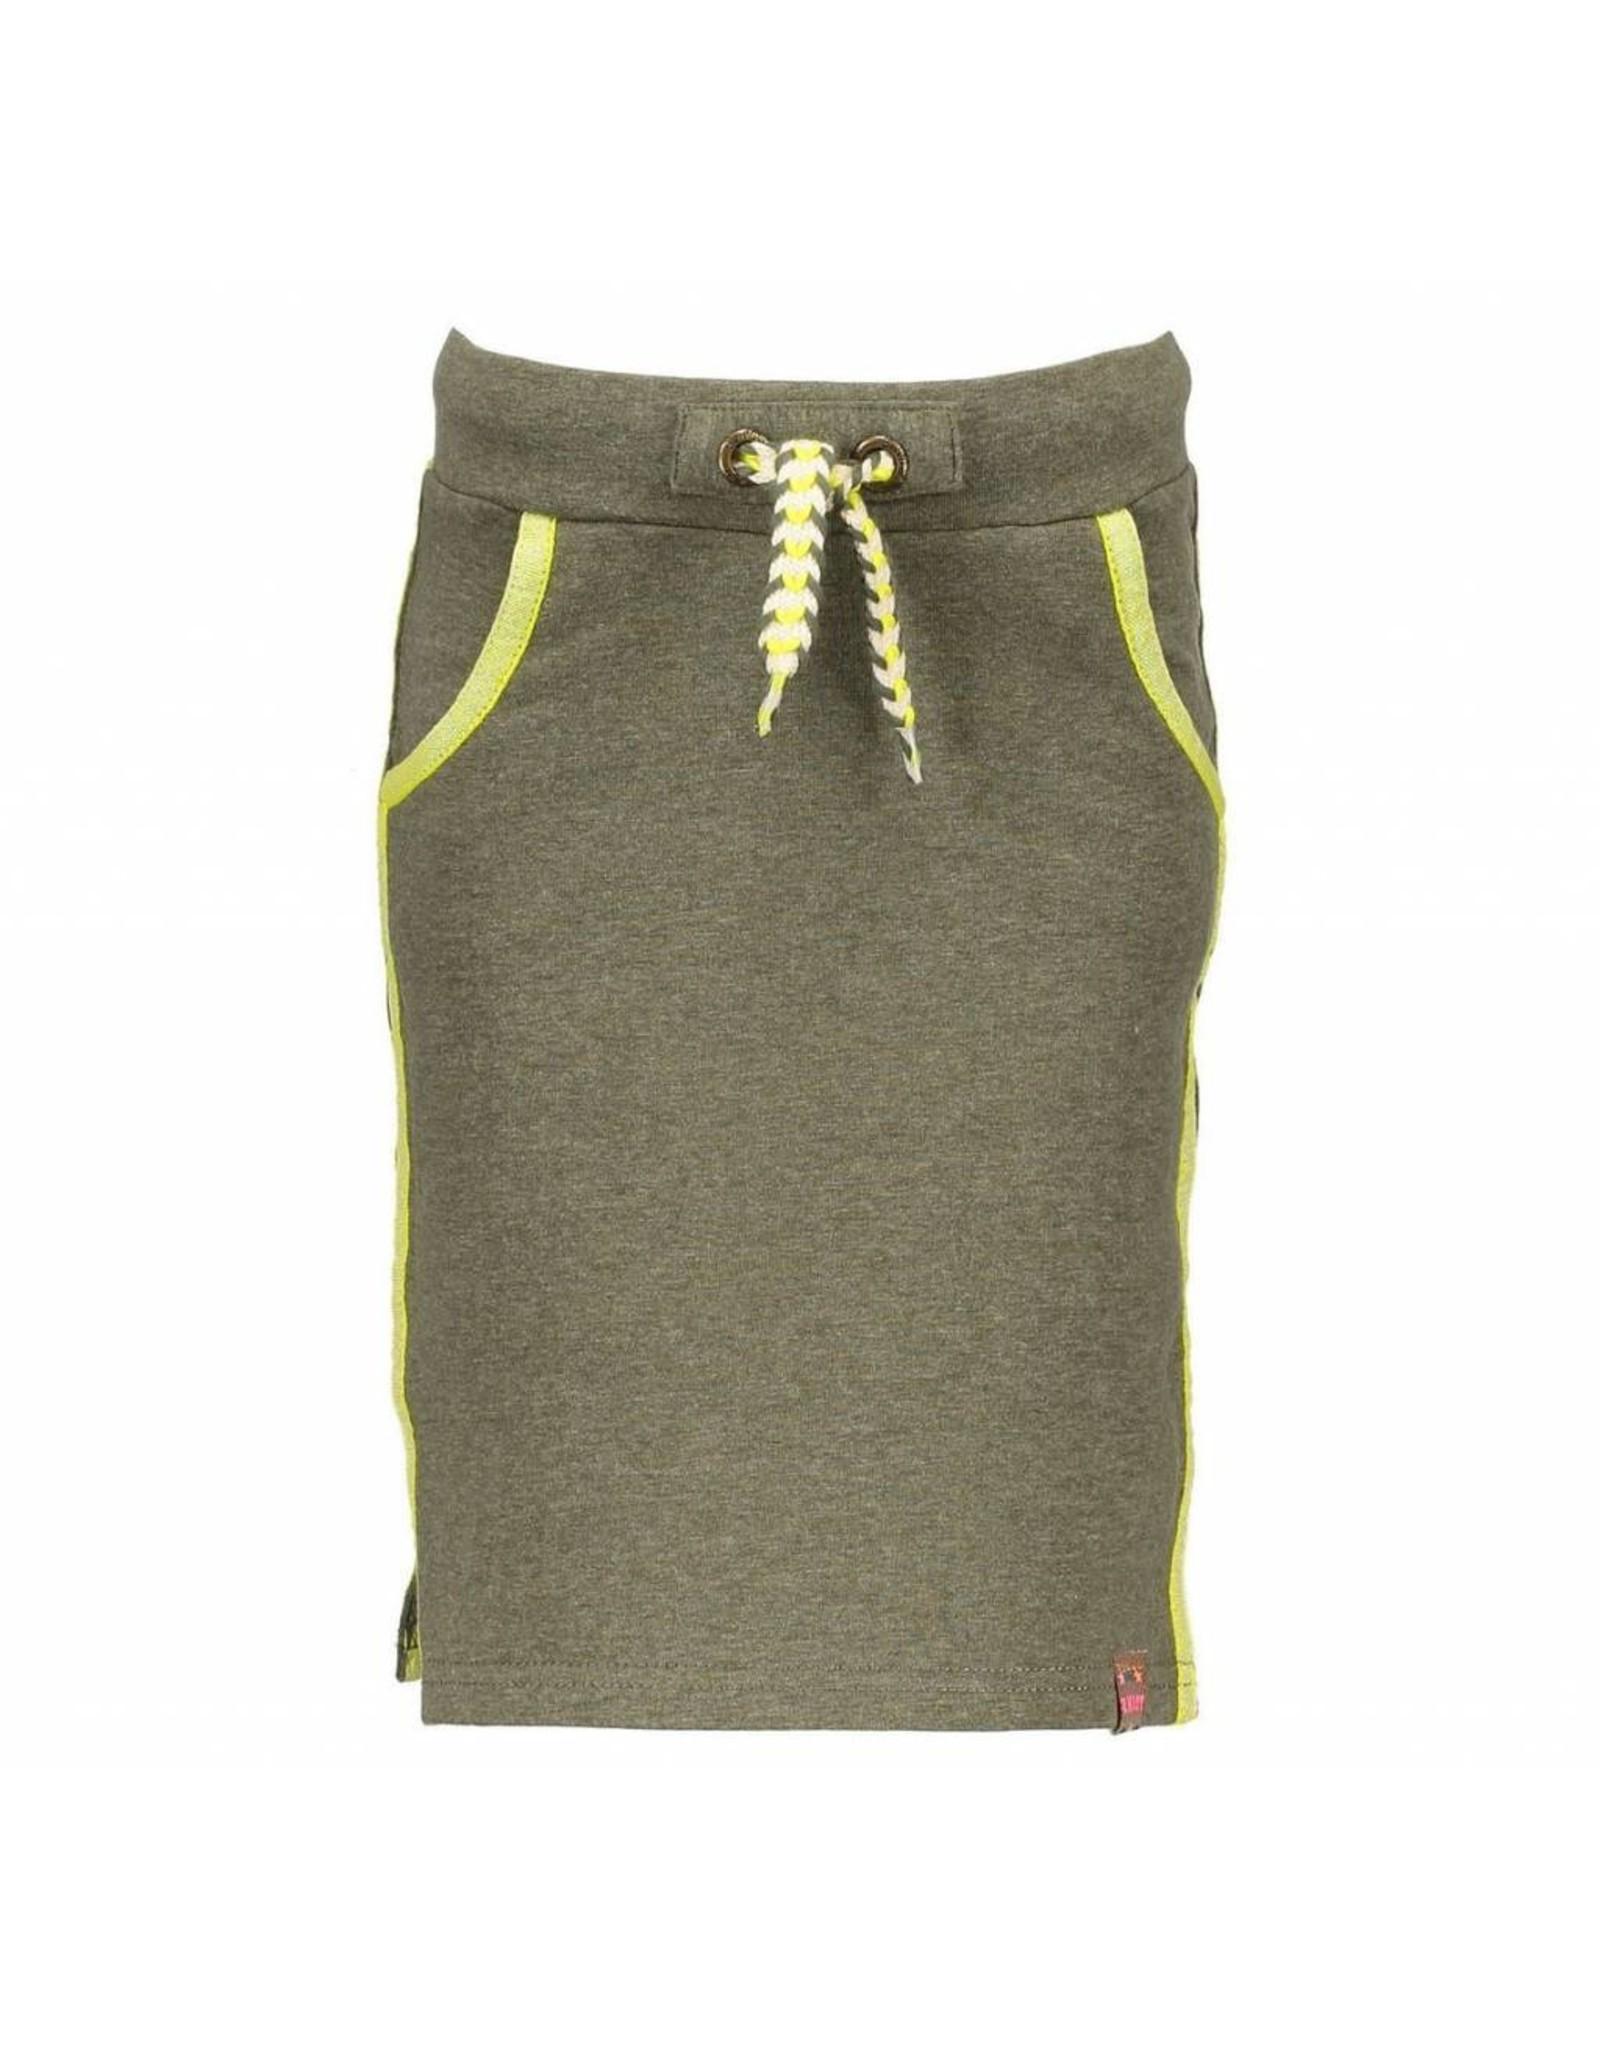 B.Nosy B. Nosy Girls Plain Skirt knee length crocodile